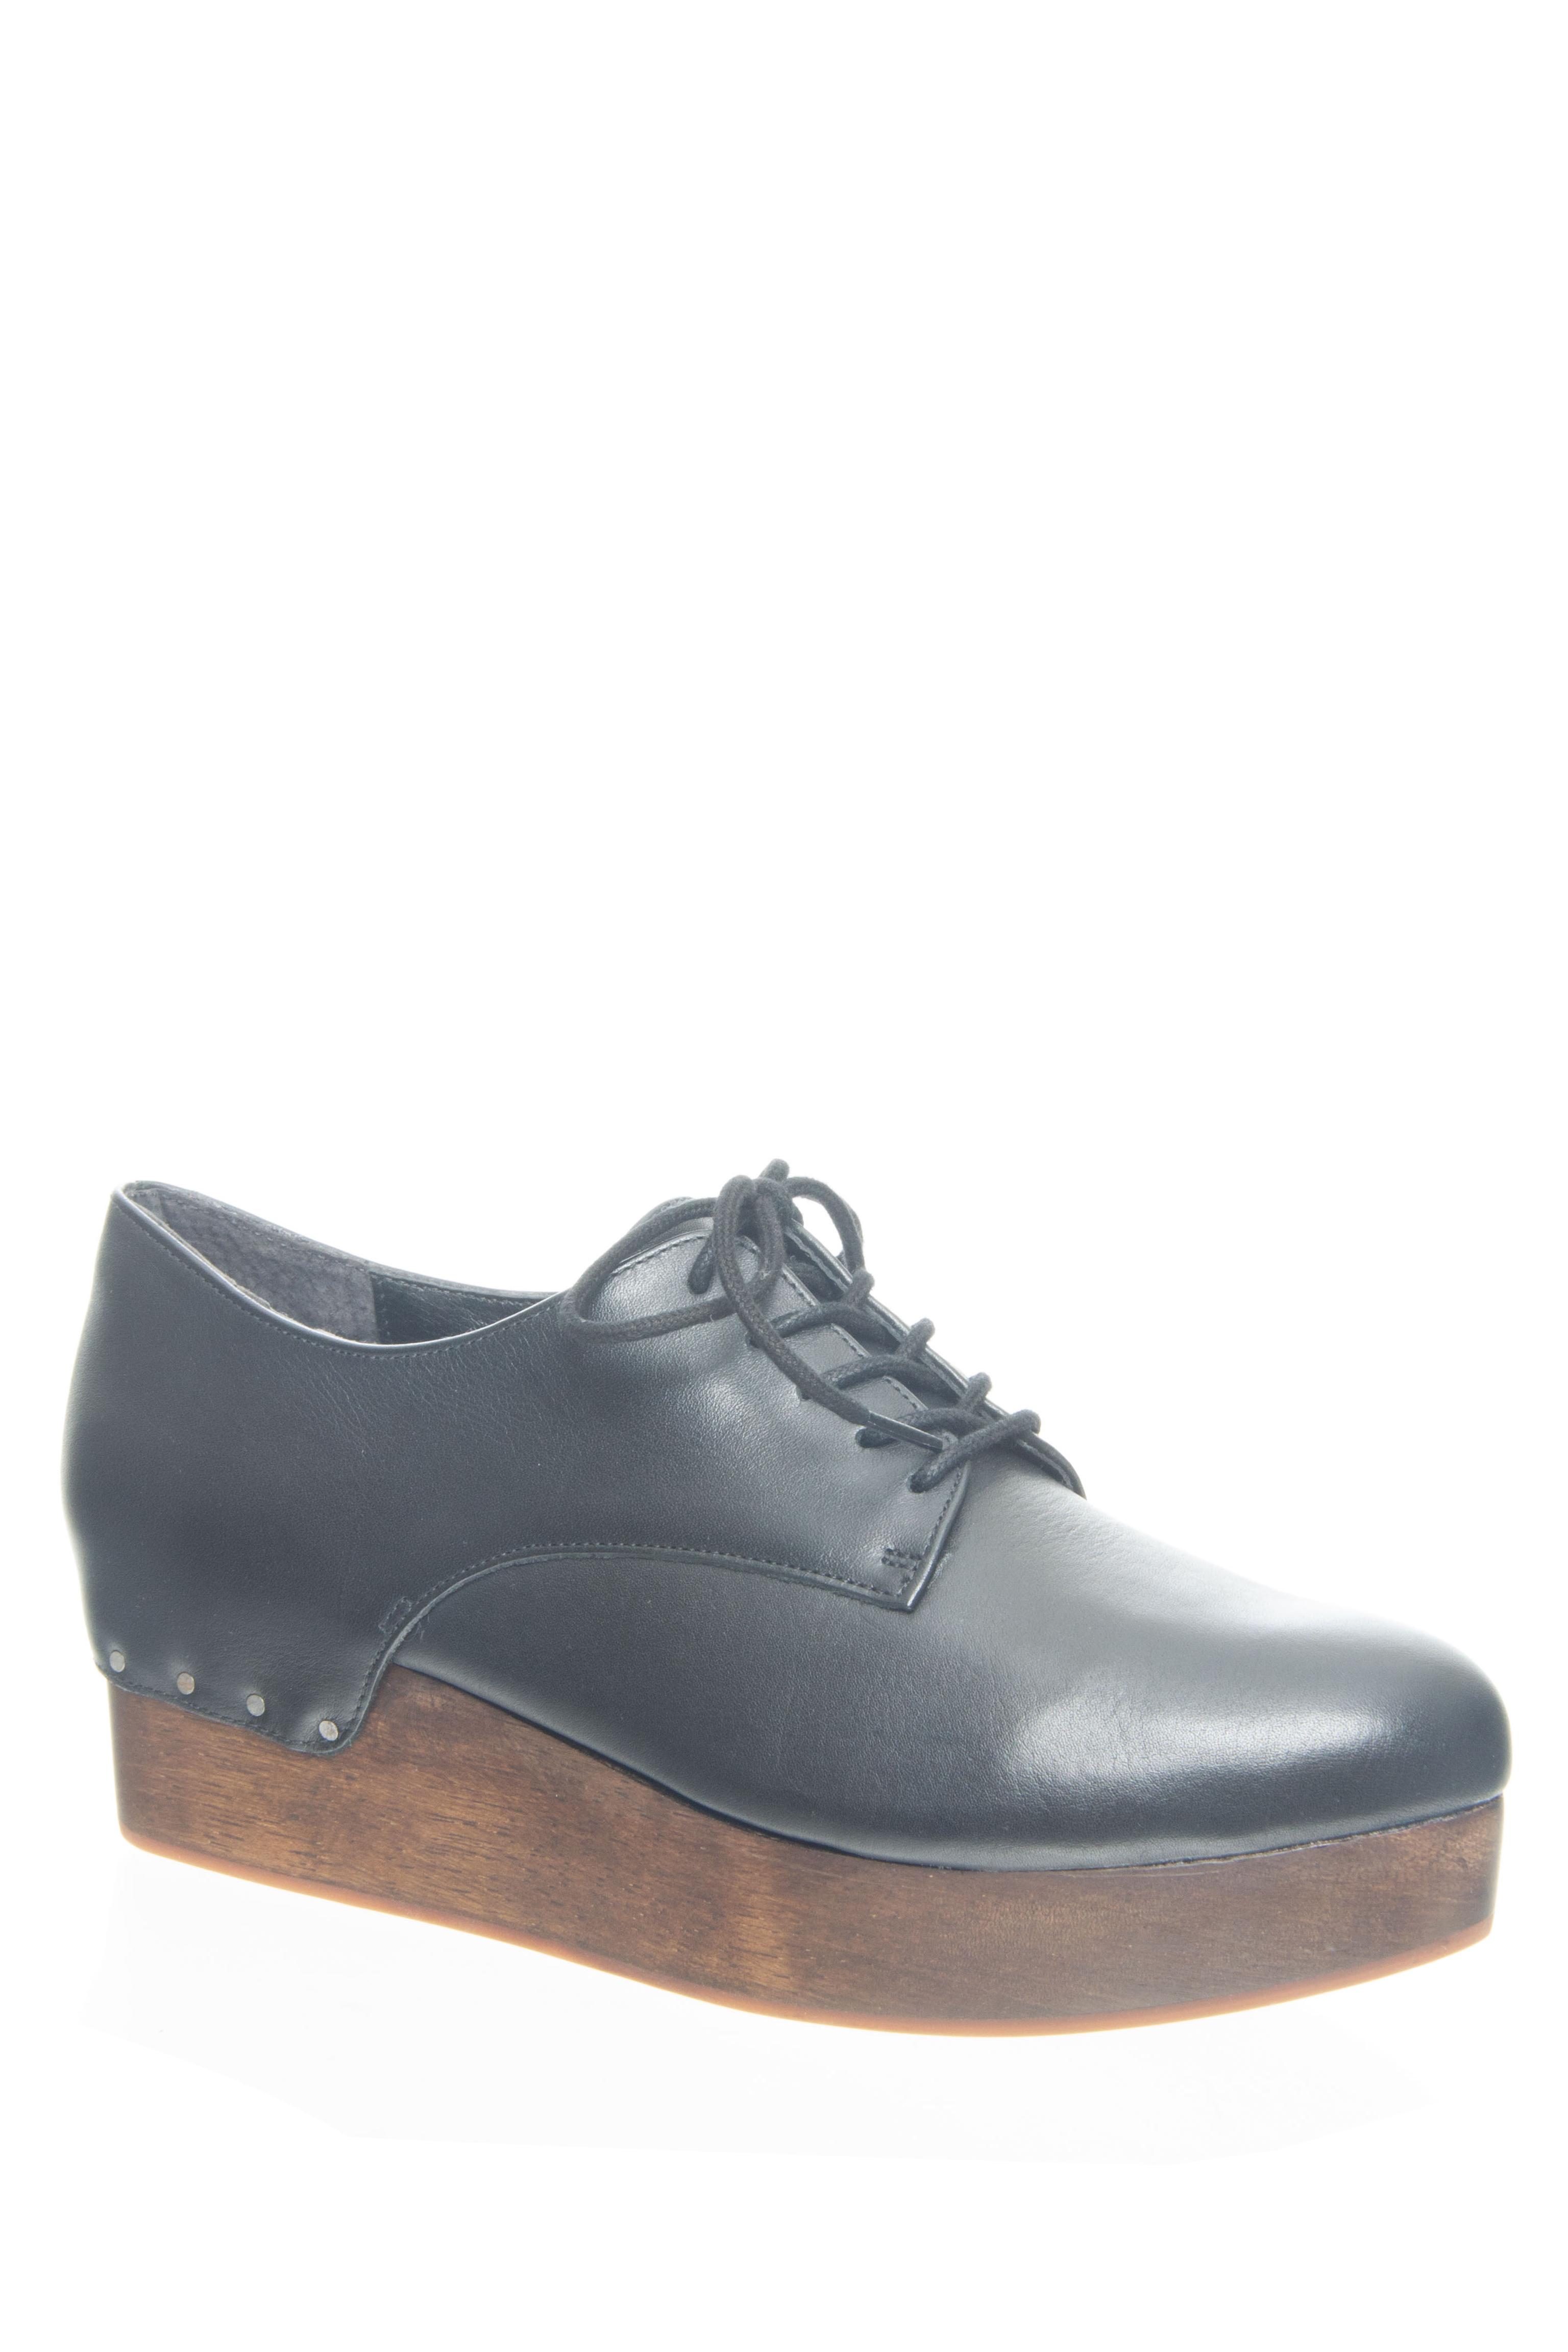 Kelsi Dagger Jamie Platform Wedge Oxford - Black